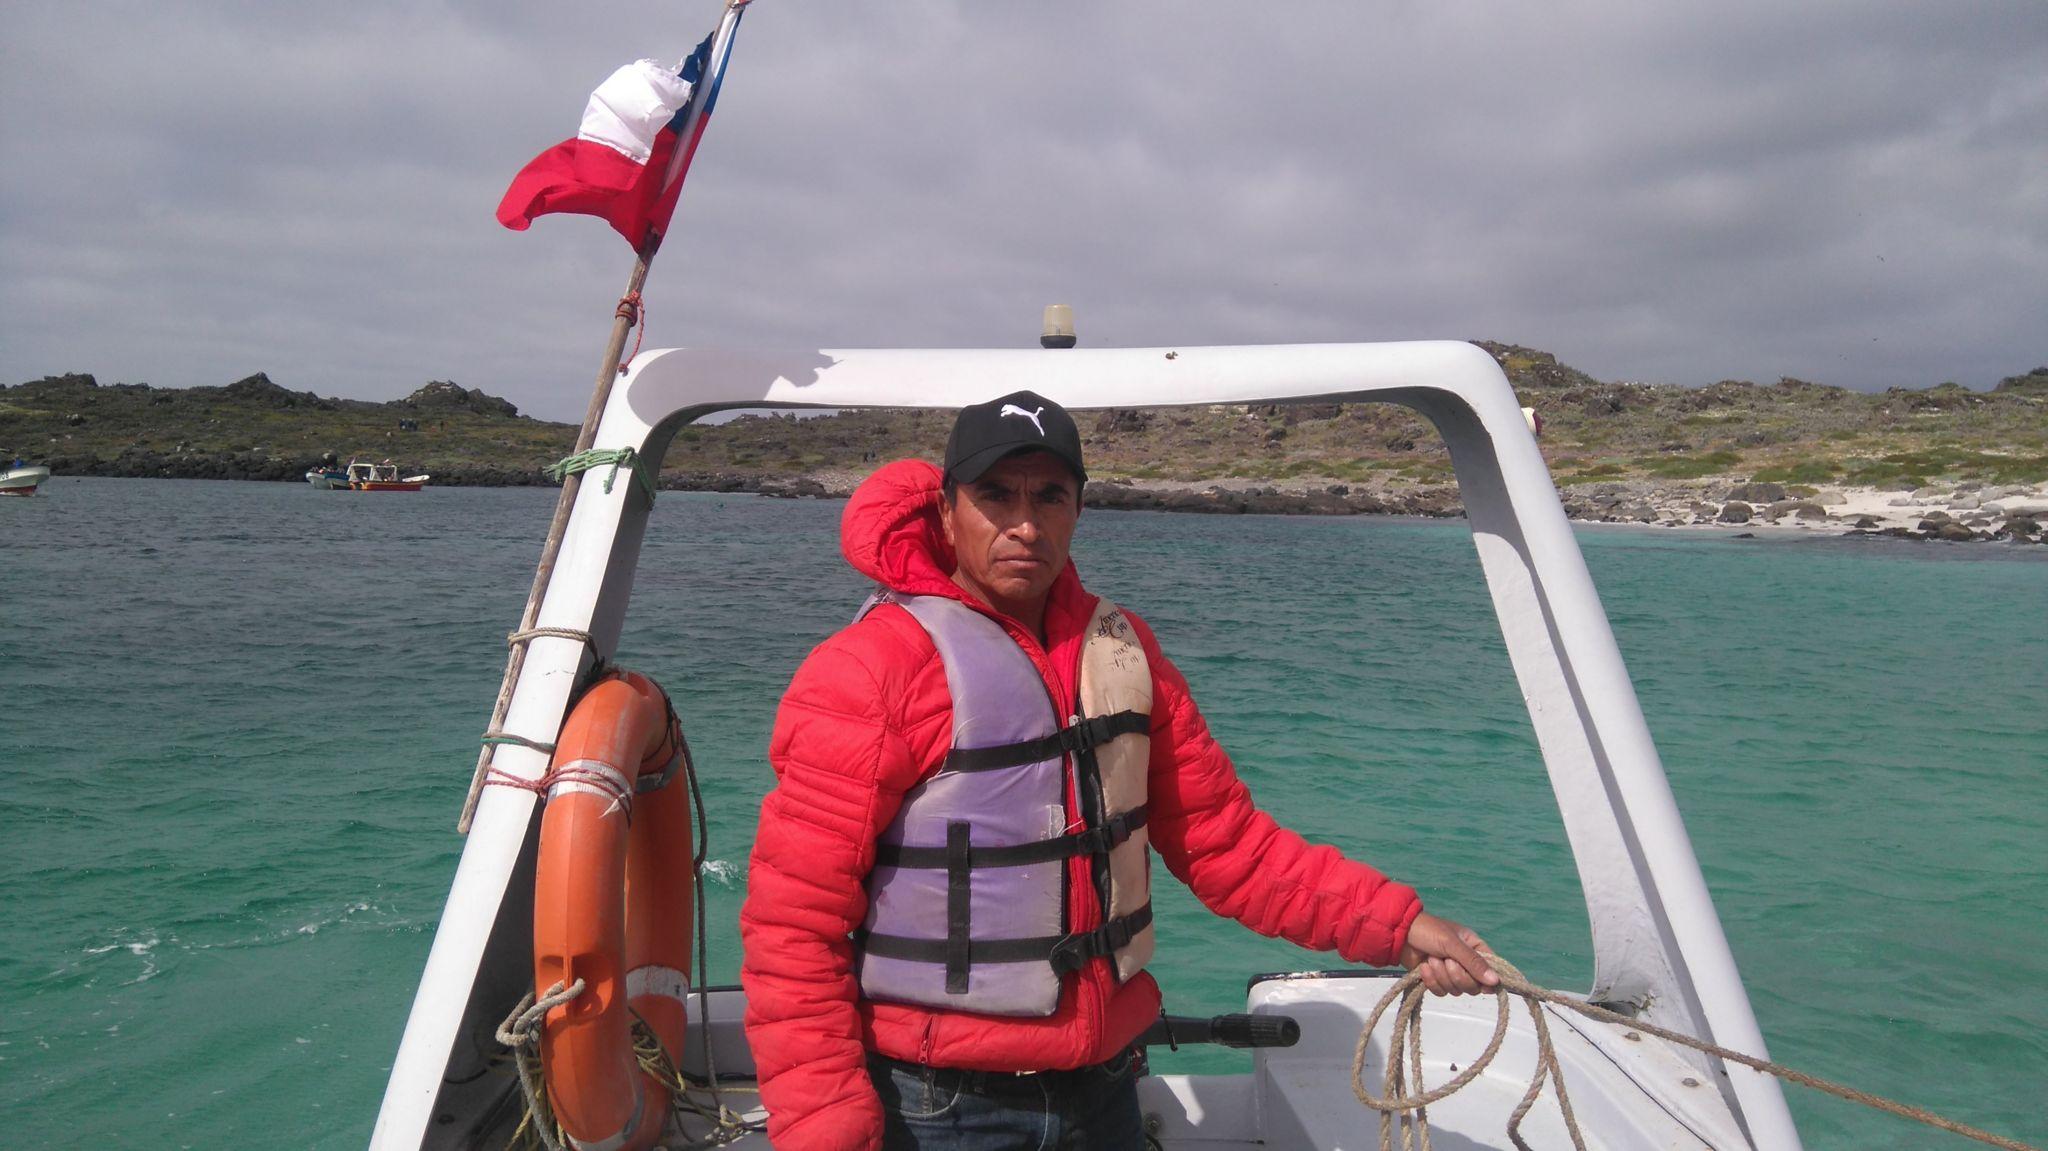 Fisherman Salvador Vergara in a boat